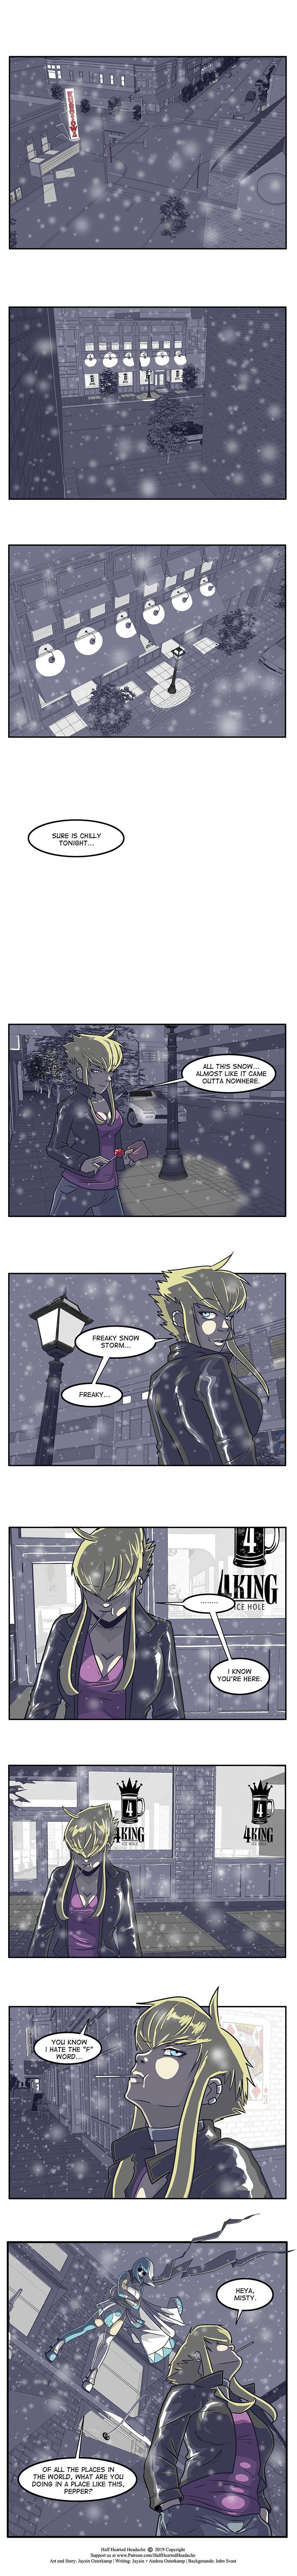 695 – Freak Snow Storm